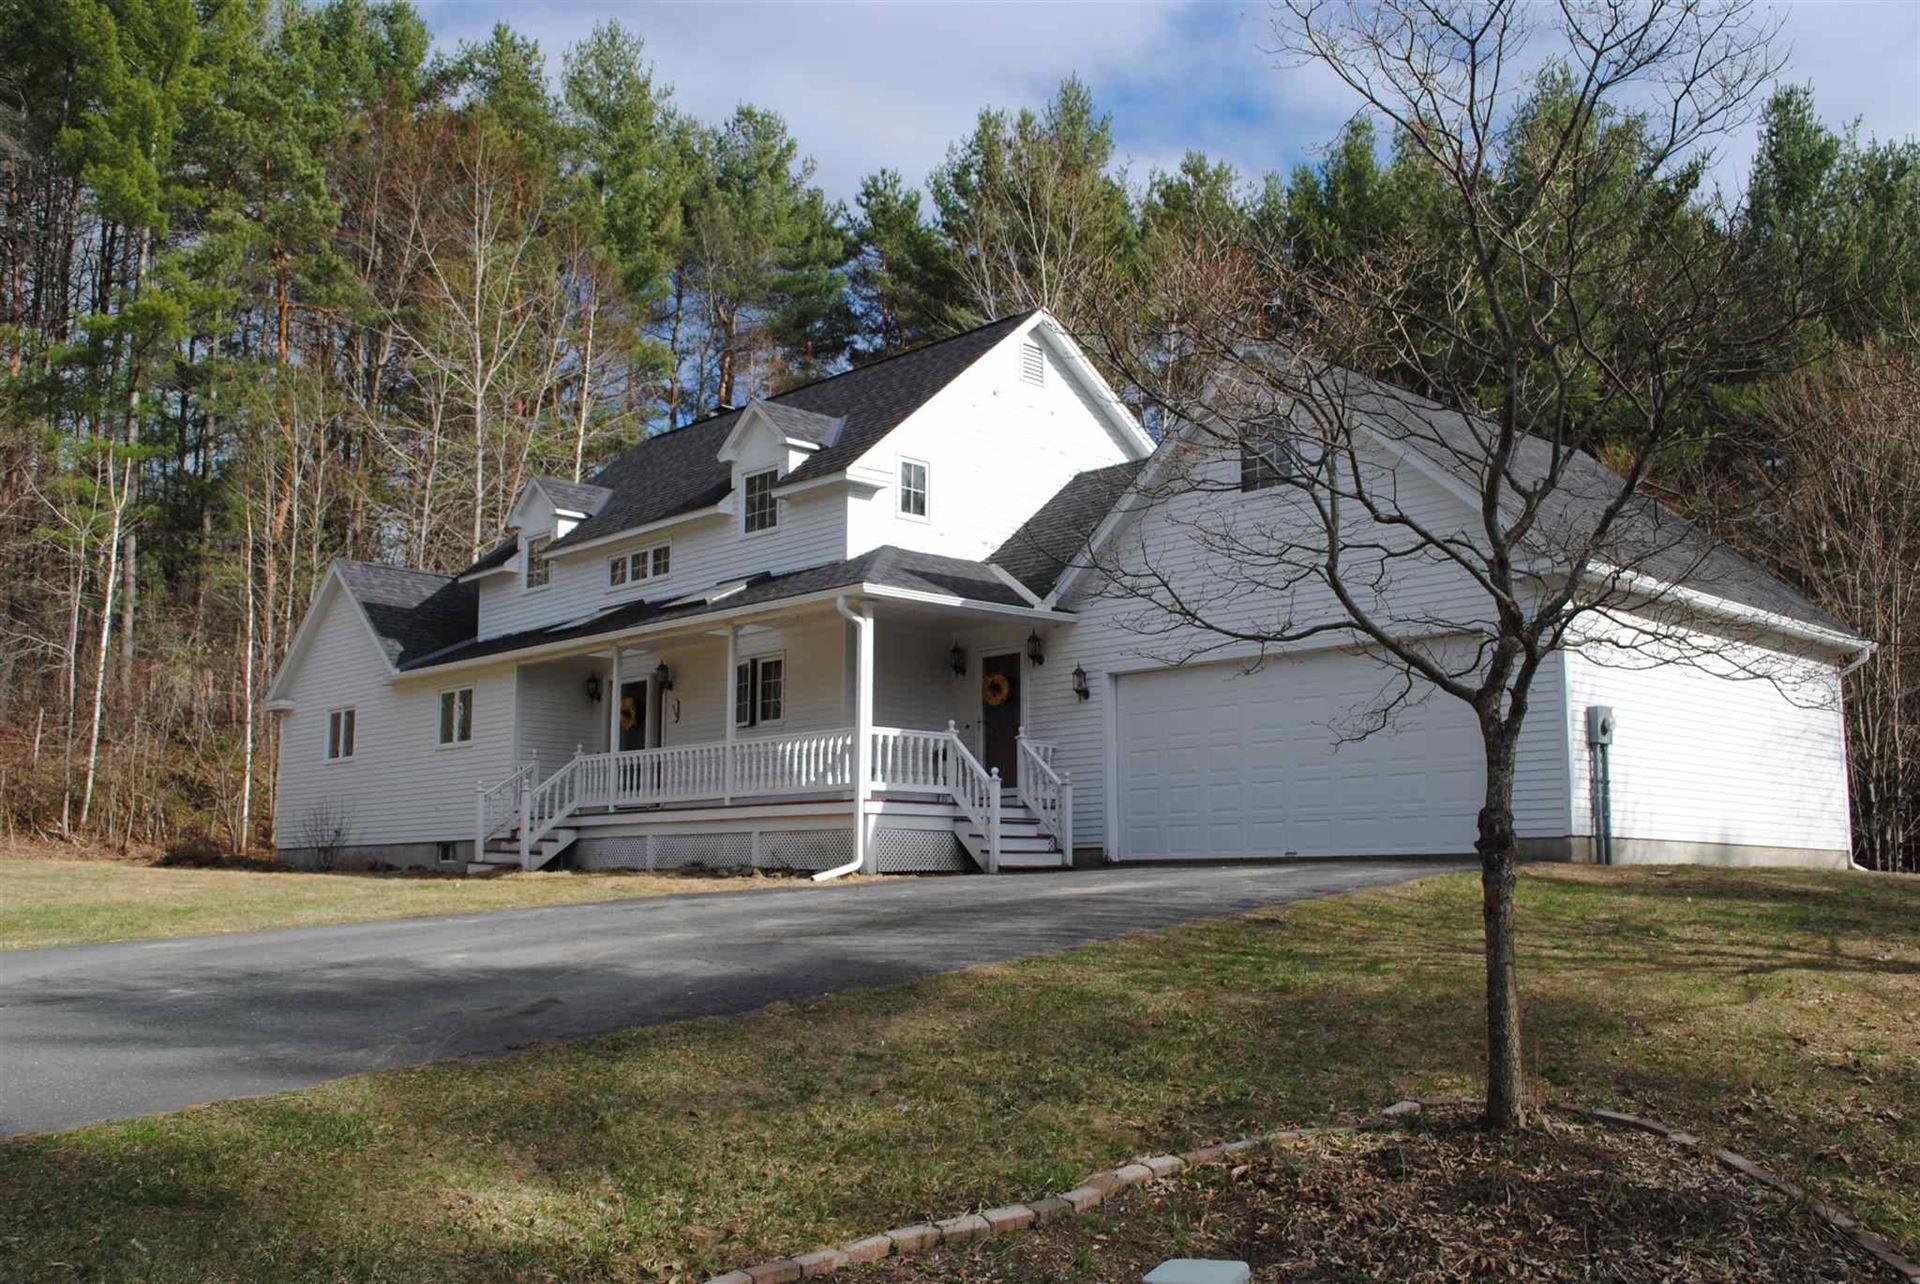 515 Farmer Drive, Saint Johnsbury, VT 05819 - MLS#: 4848766